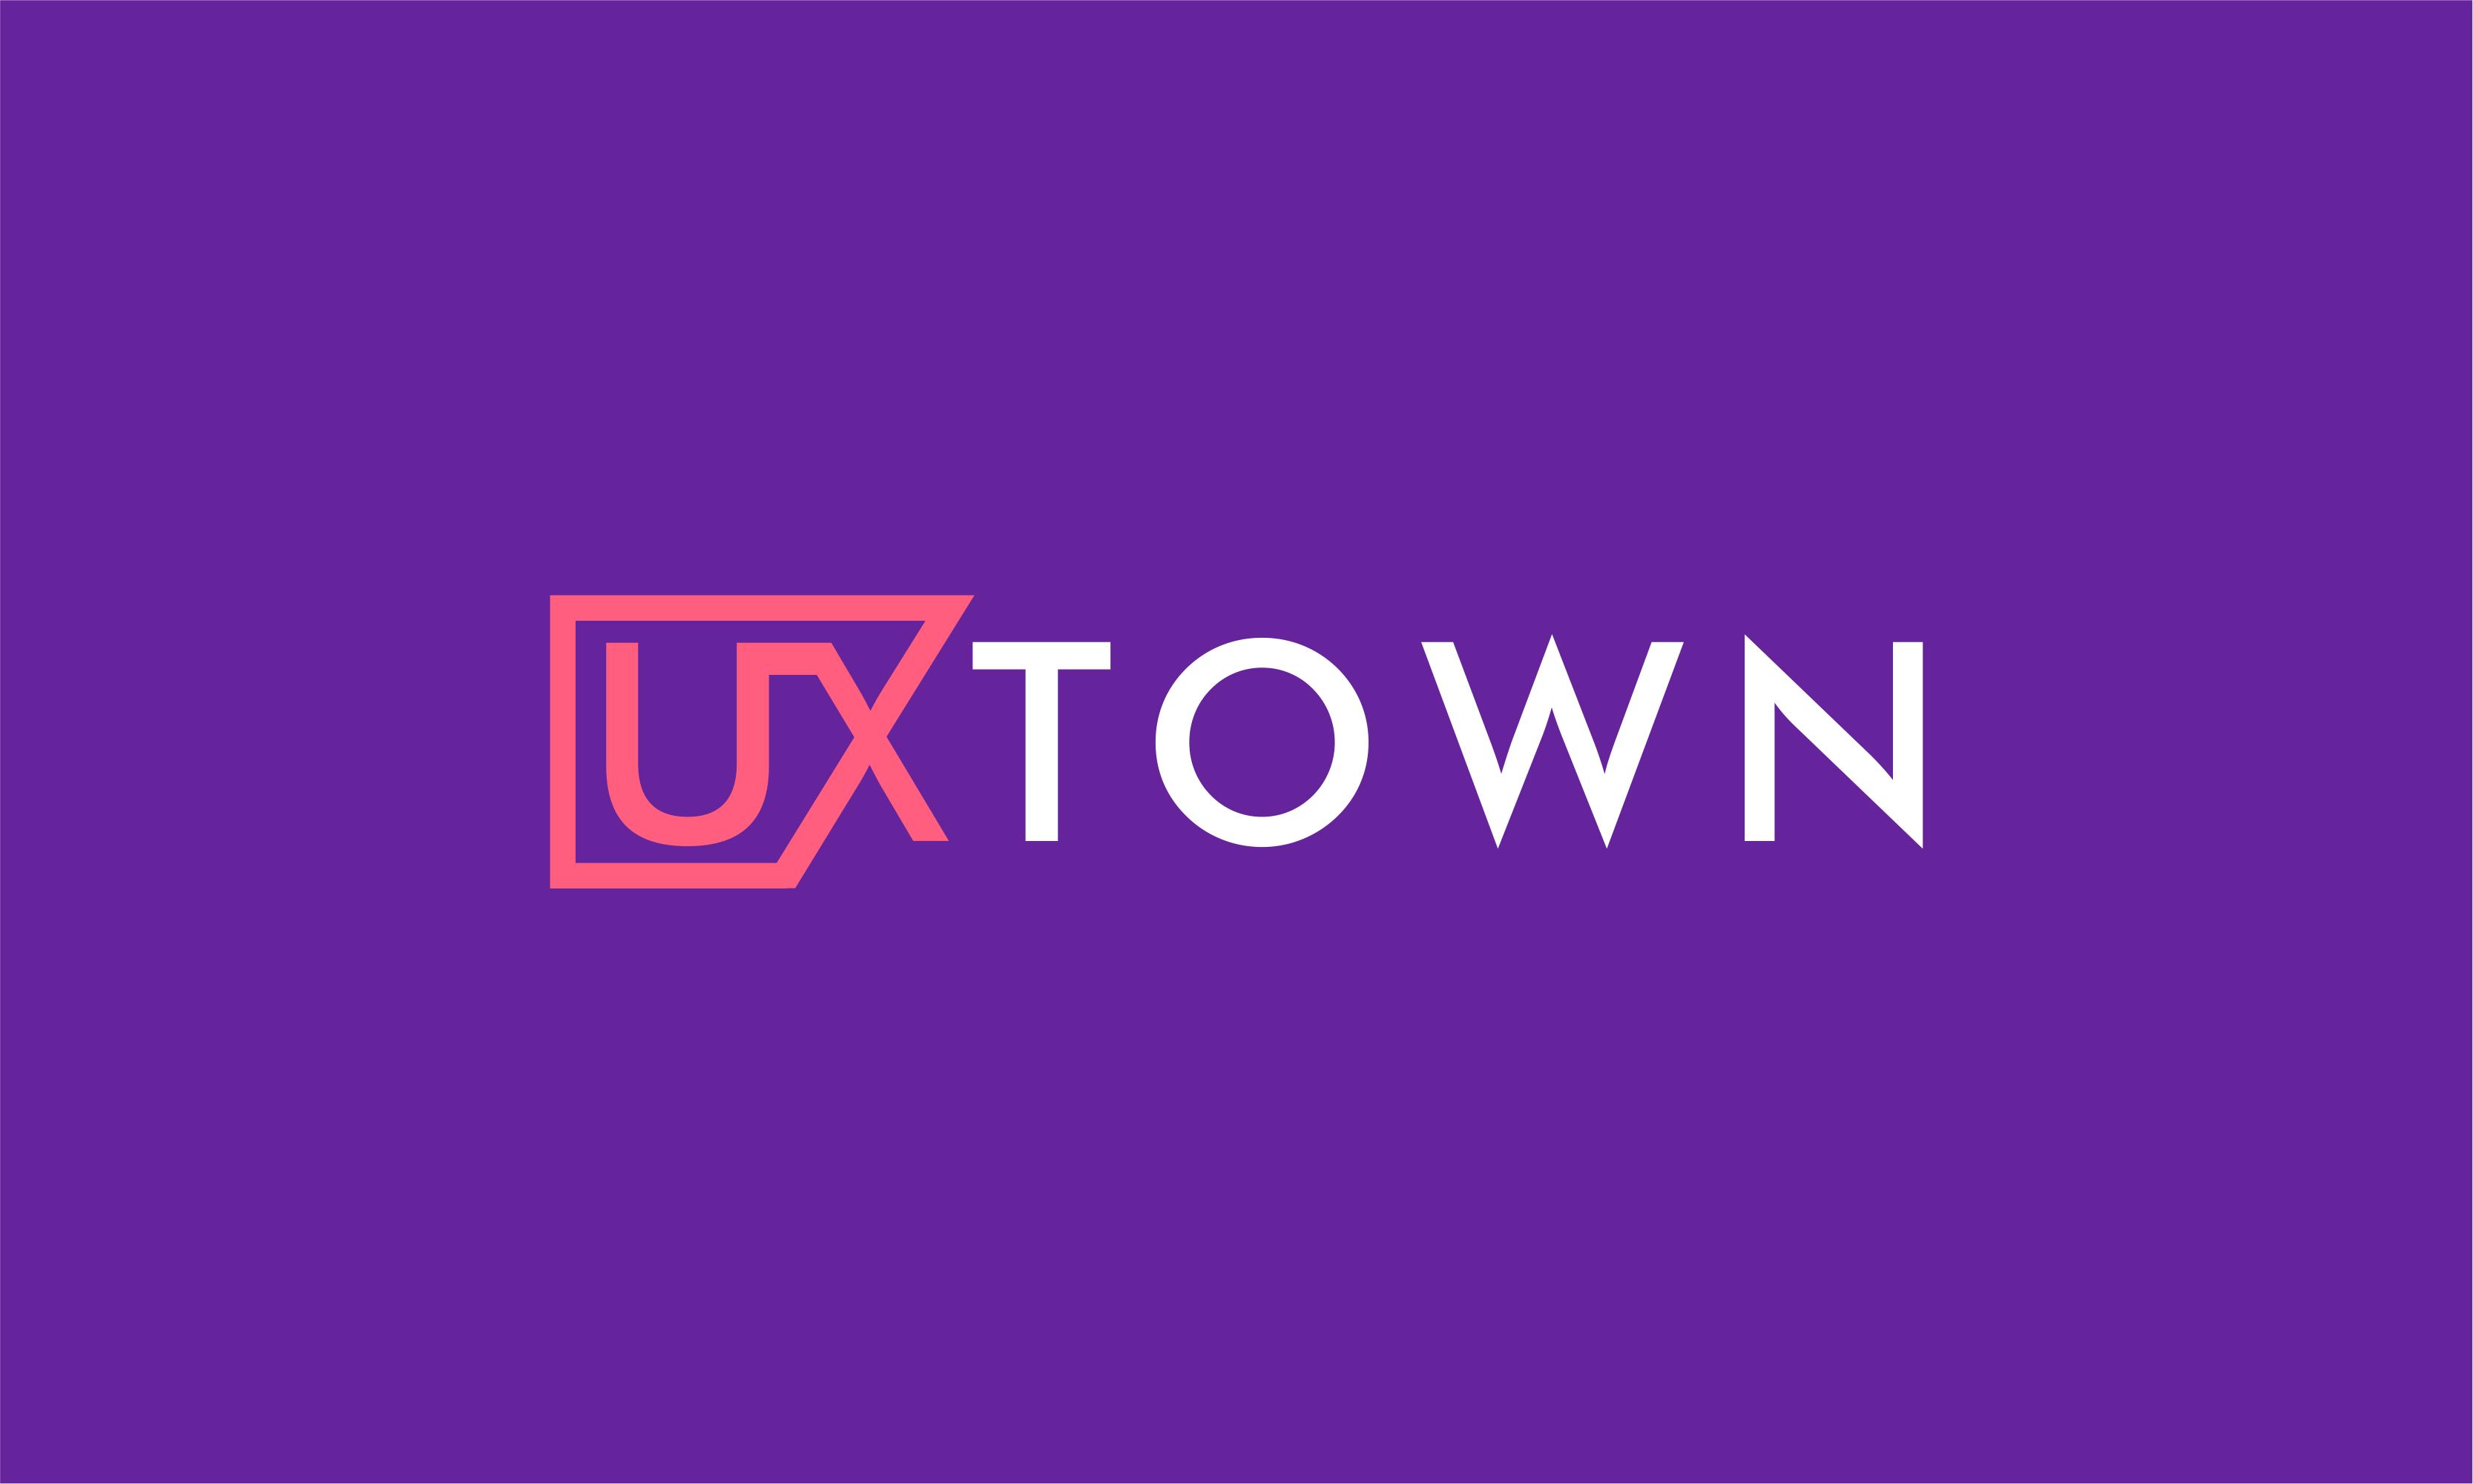 Uxtown